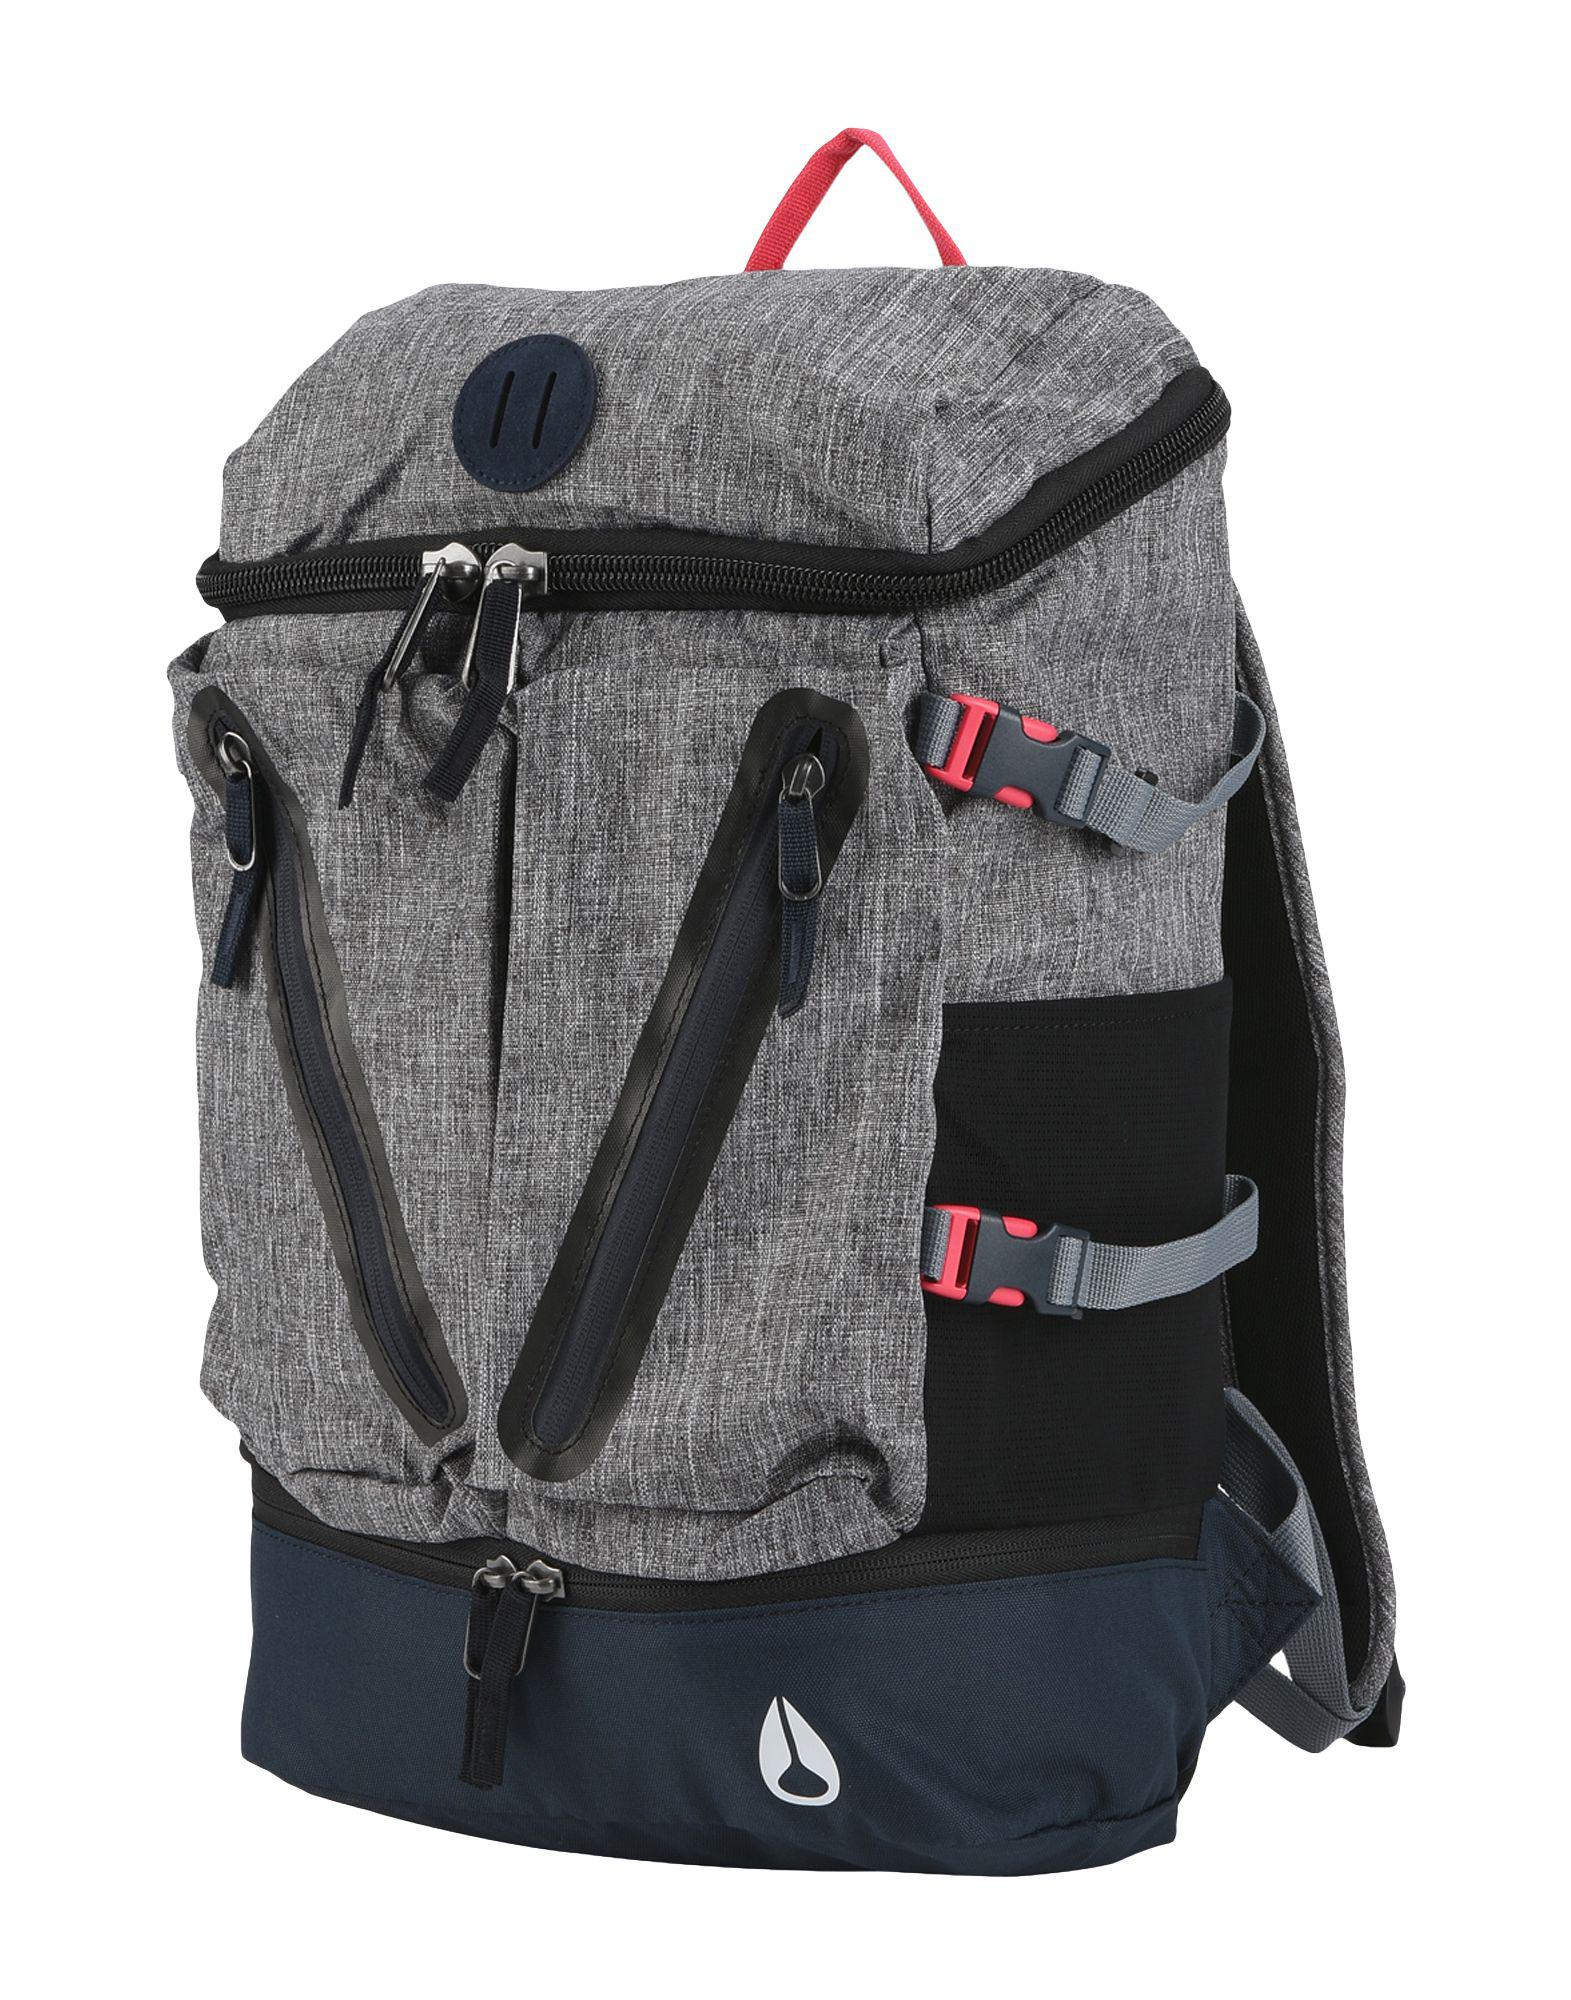 28661f3c1583 Lyst - Nixon Backpacks   Fanny Packs in Gray for Men